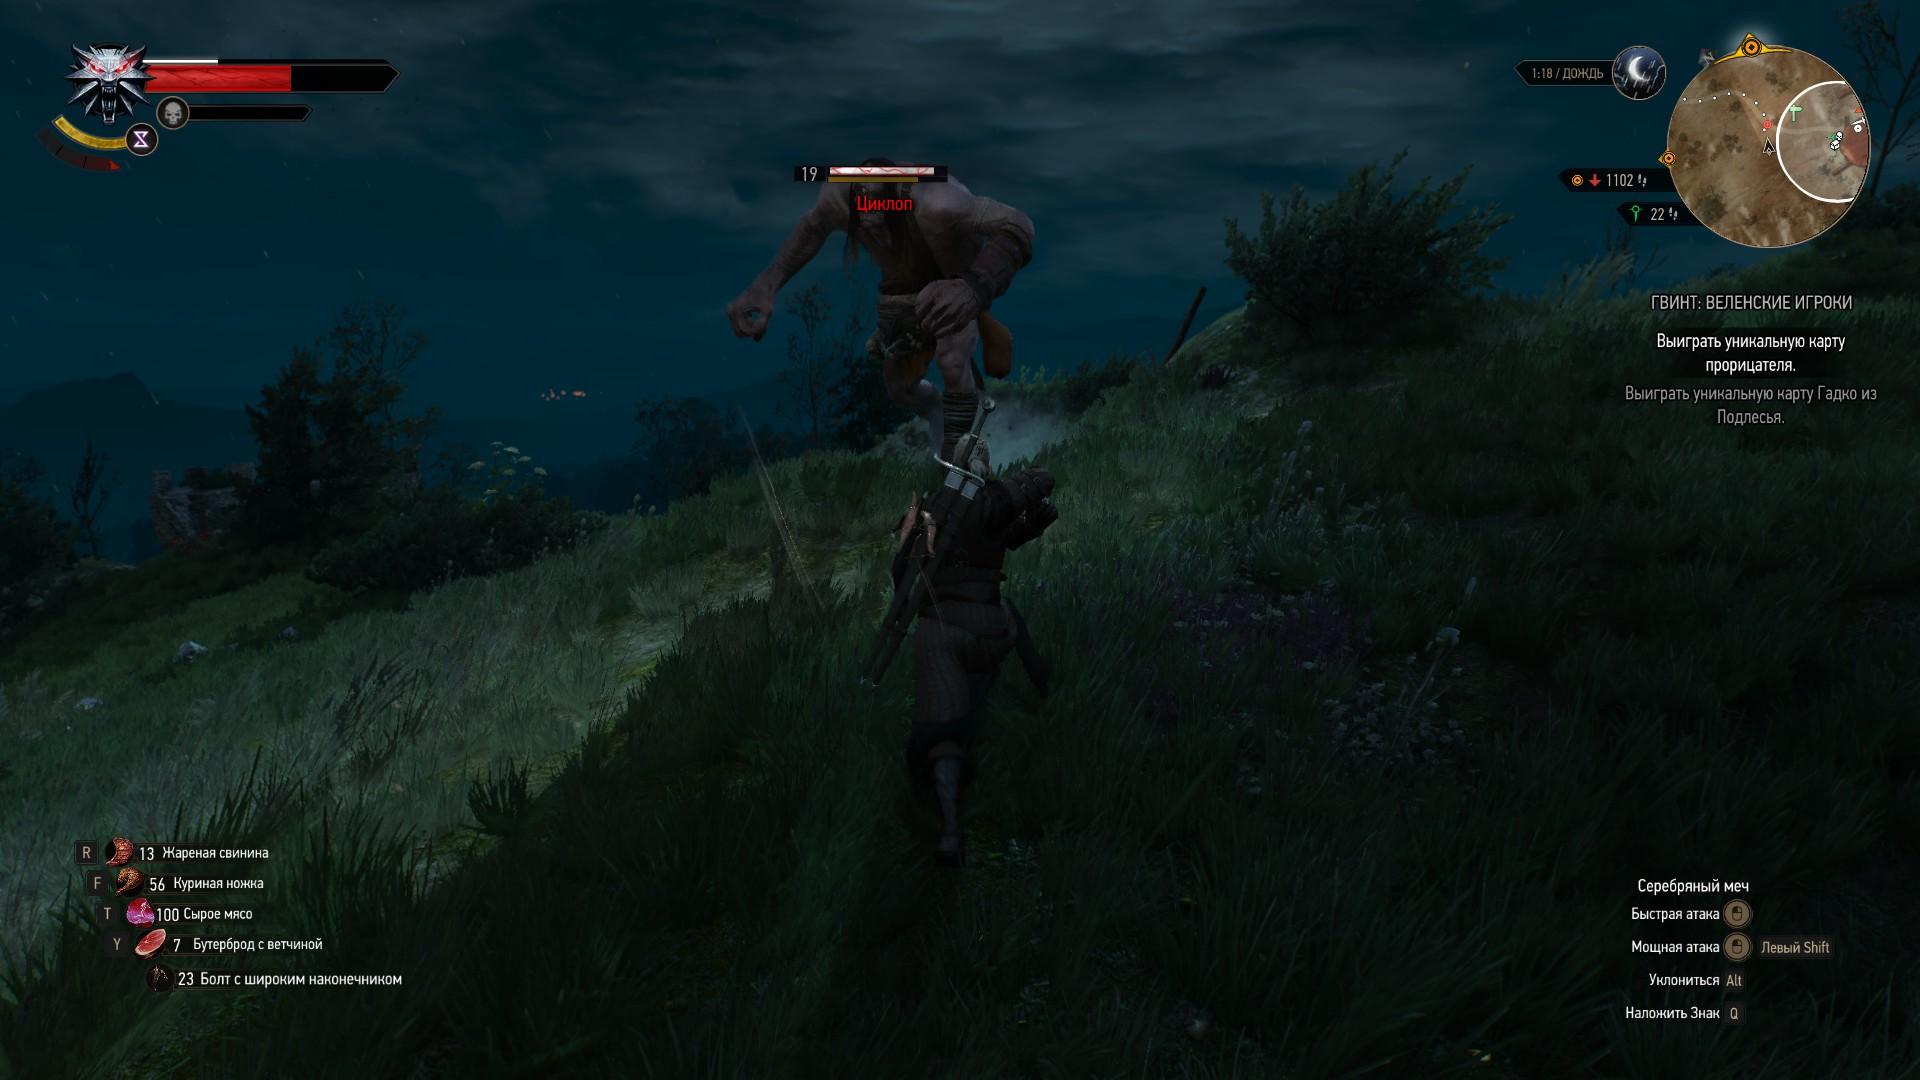 292030_screenshots_20171118161519_1.jpg - Witcher 3: Wild Hunt, the